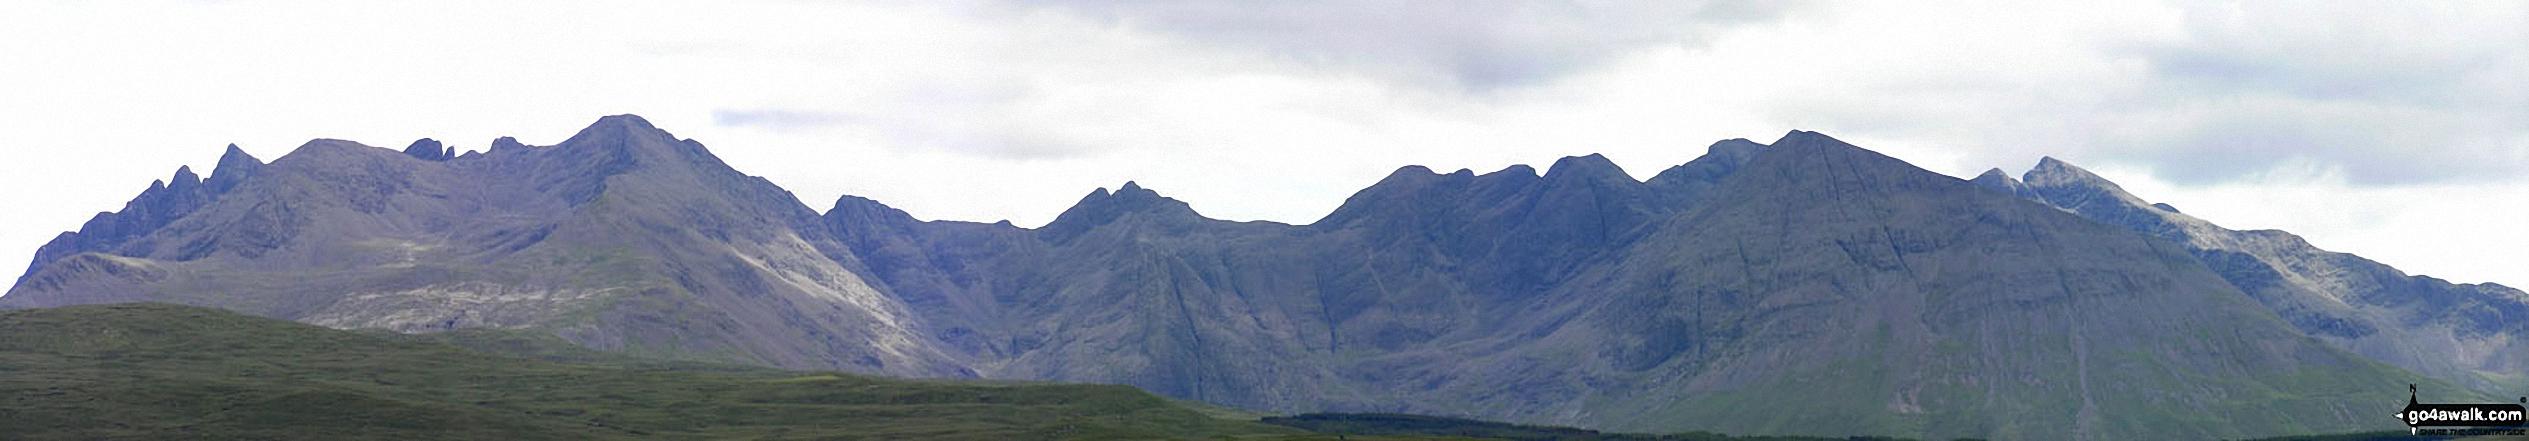 The Black Cuillin Hills taken from North of Glen Drynoch